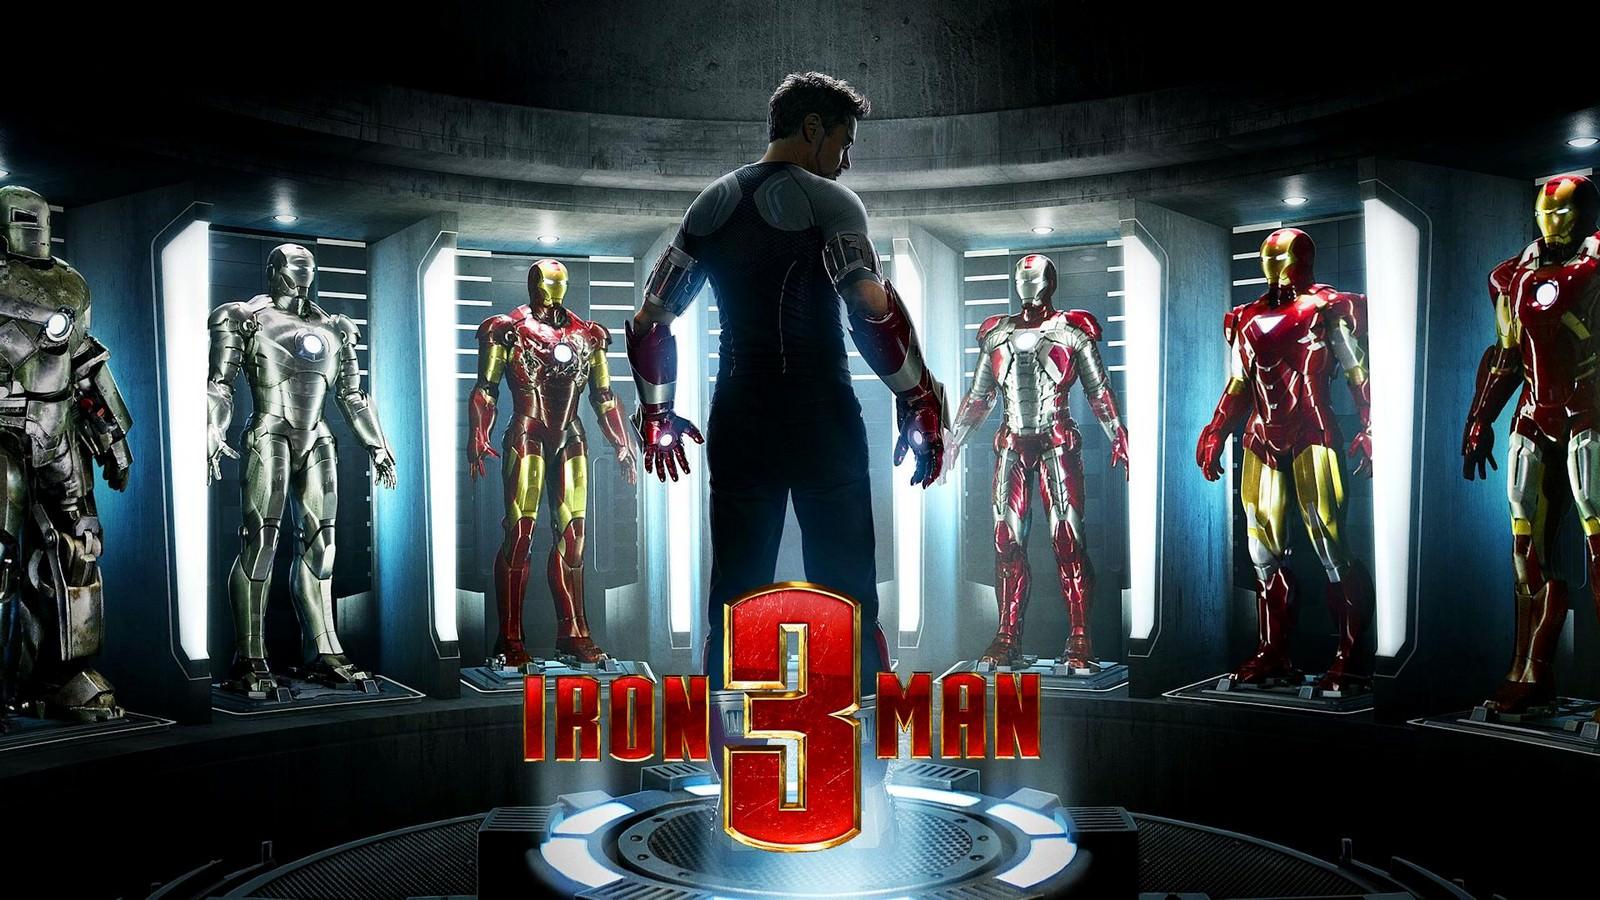 Movie, Iron Man 3(美國) / 鋼鐵人3(台) / 钢铁侠3(中) / 鐵甲奇俠3(港), 電影海報, 美國, 橫版